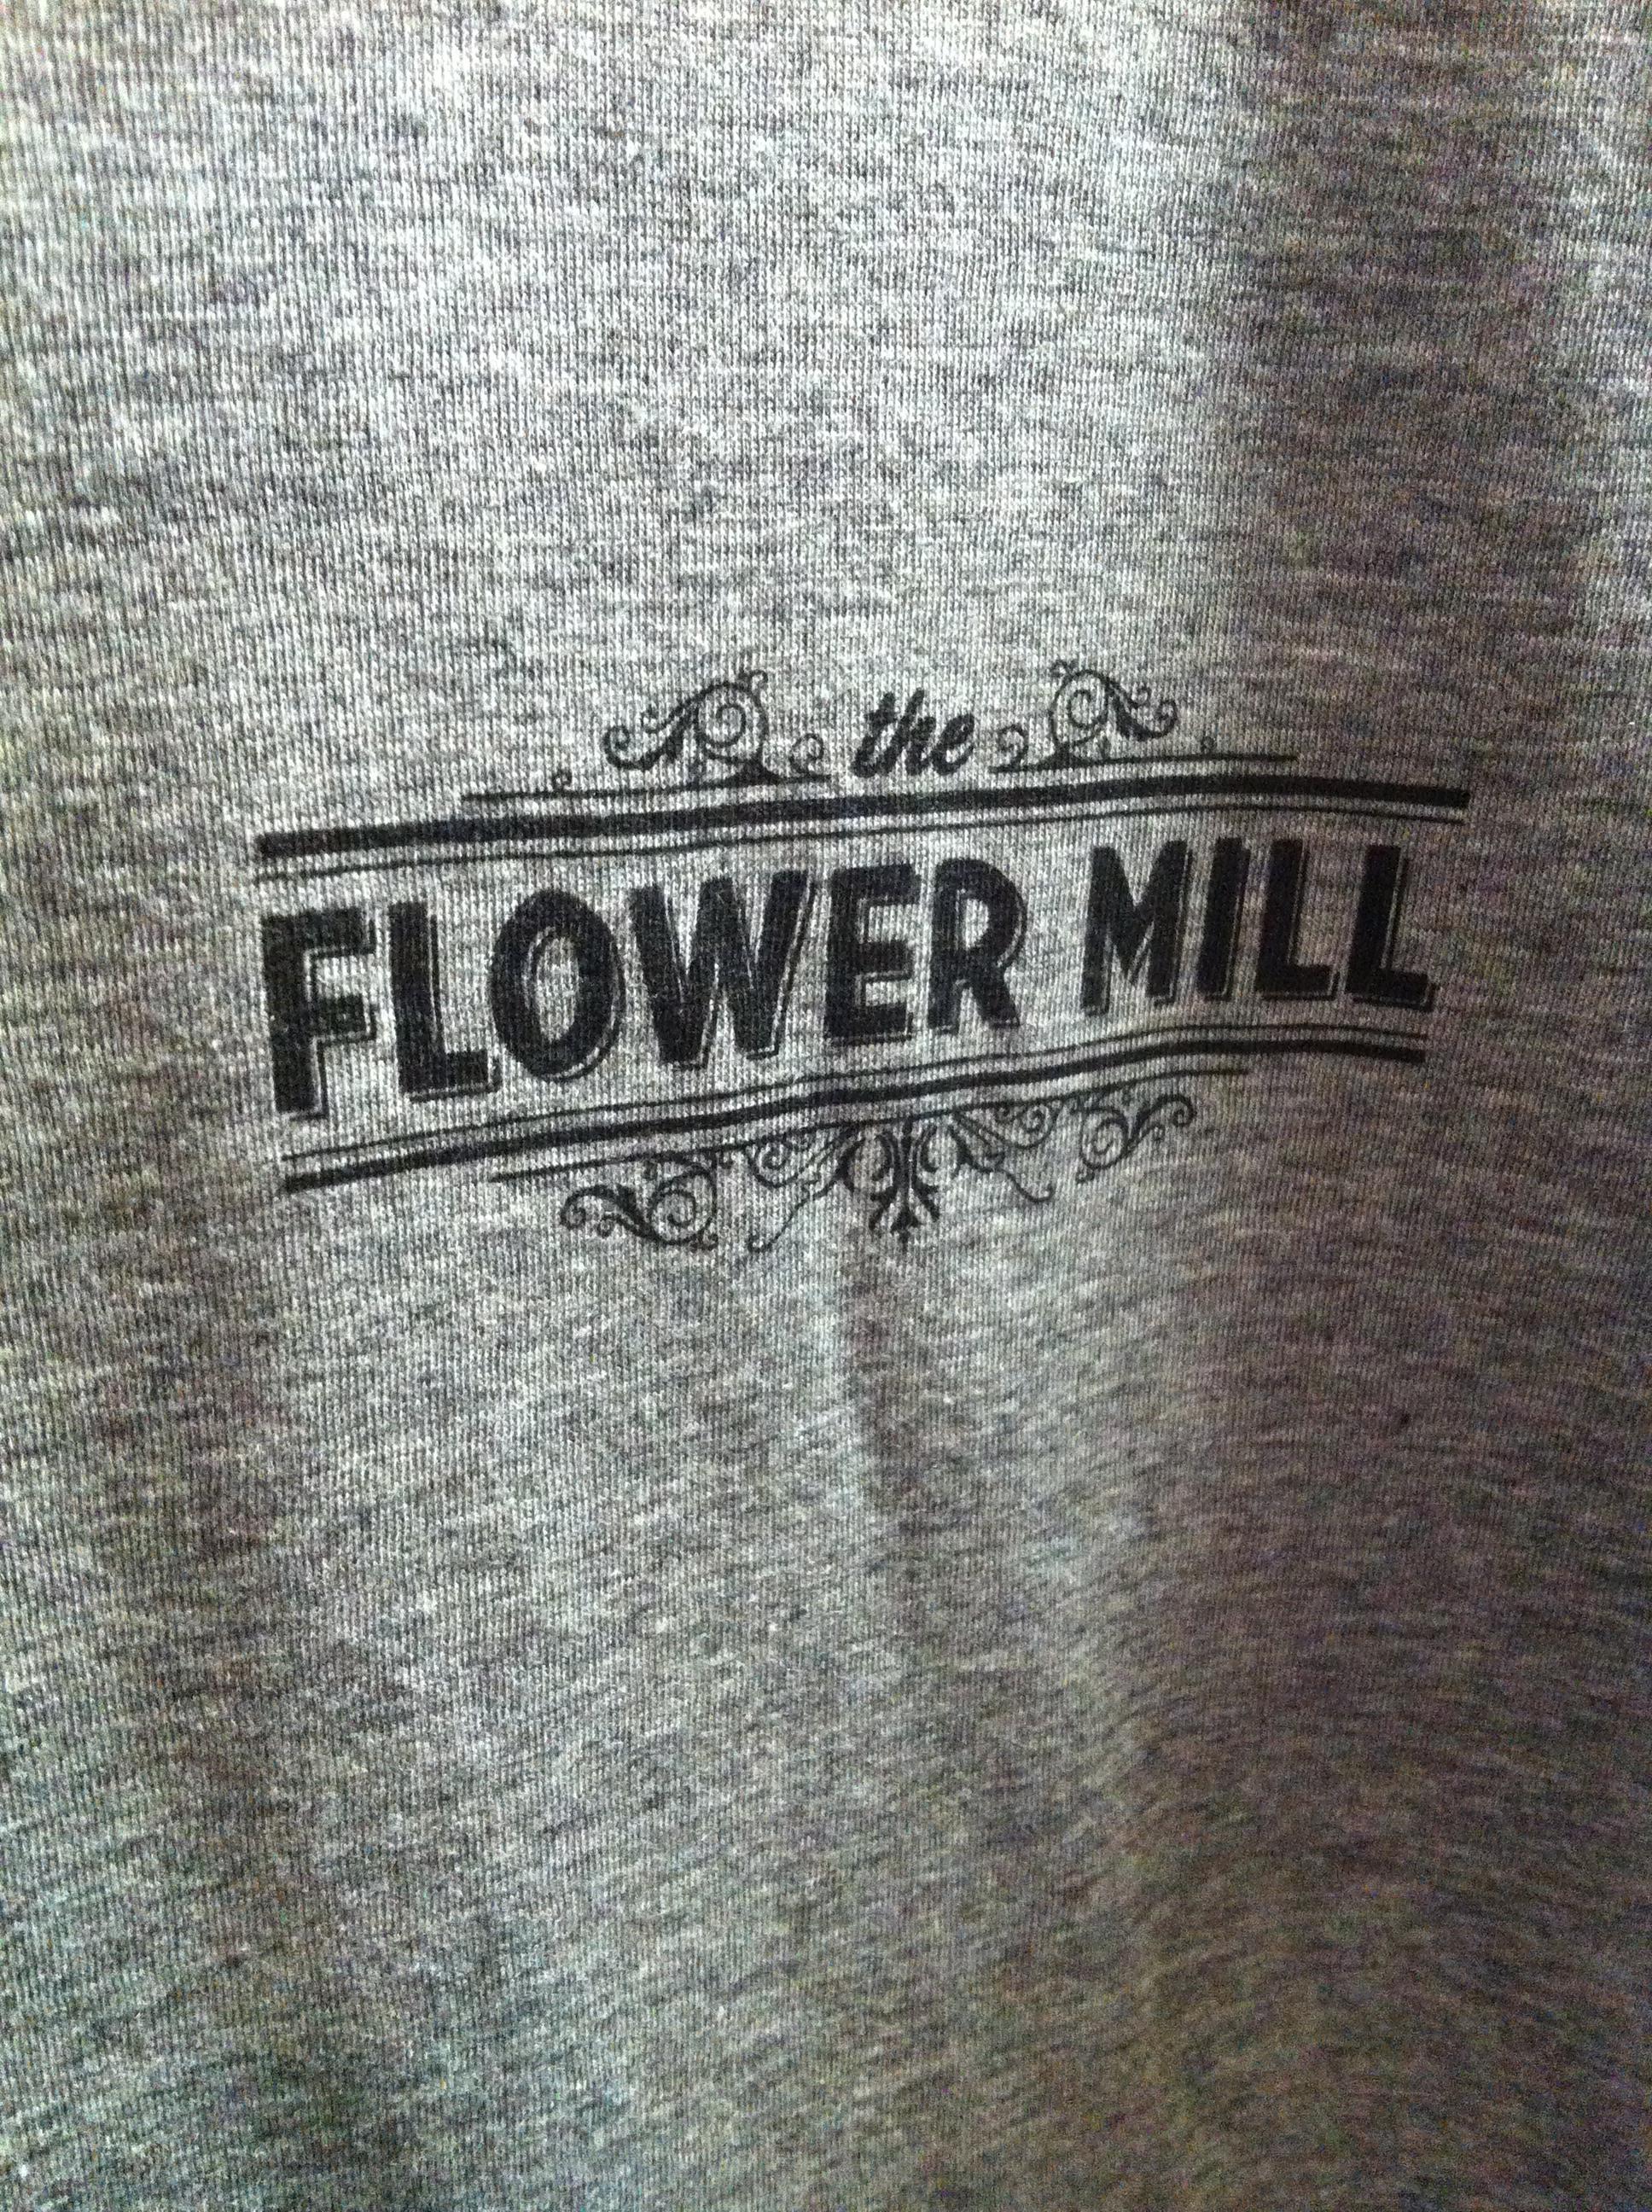 flowermill3.JPG